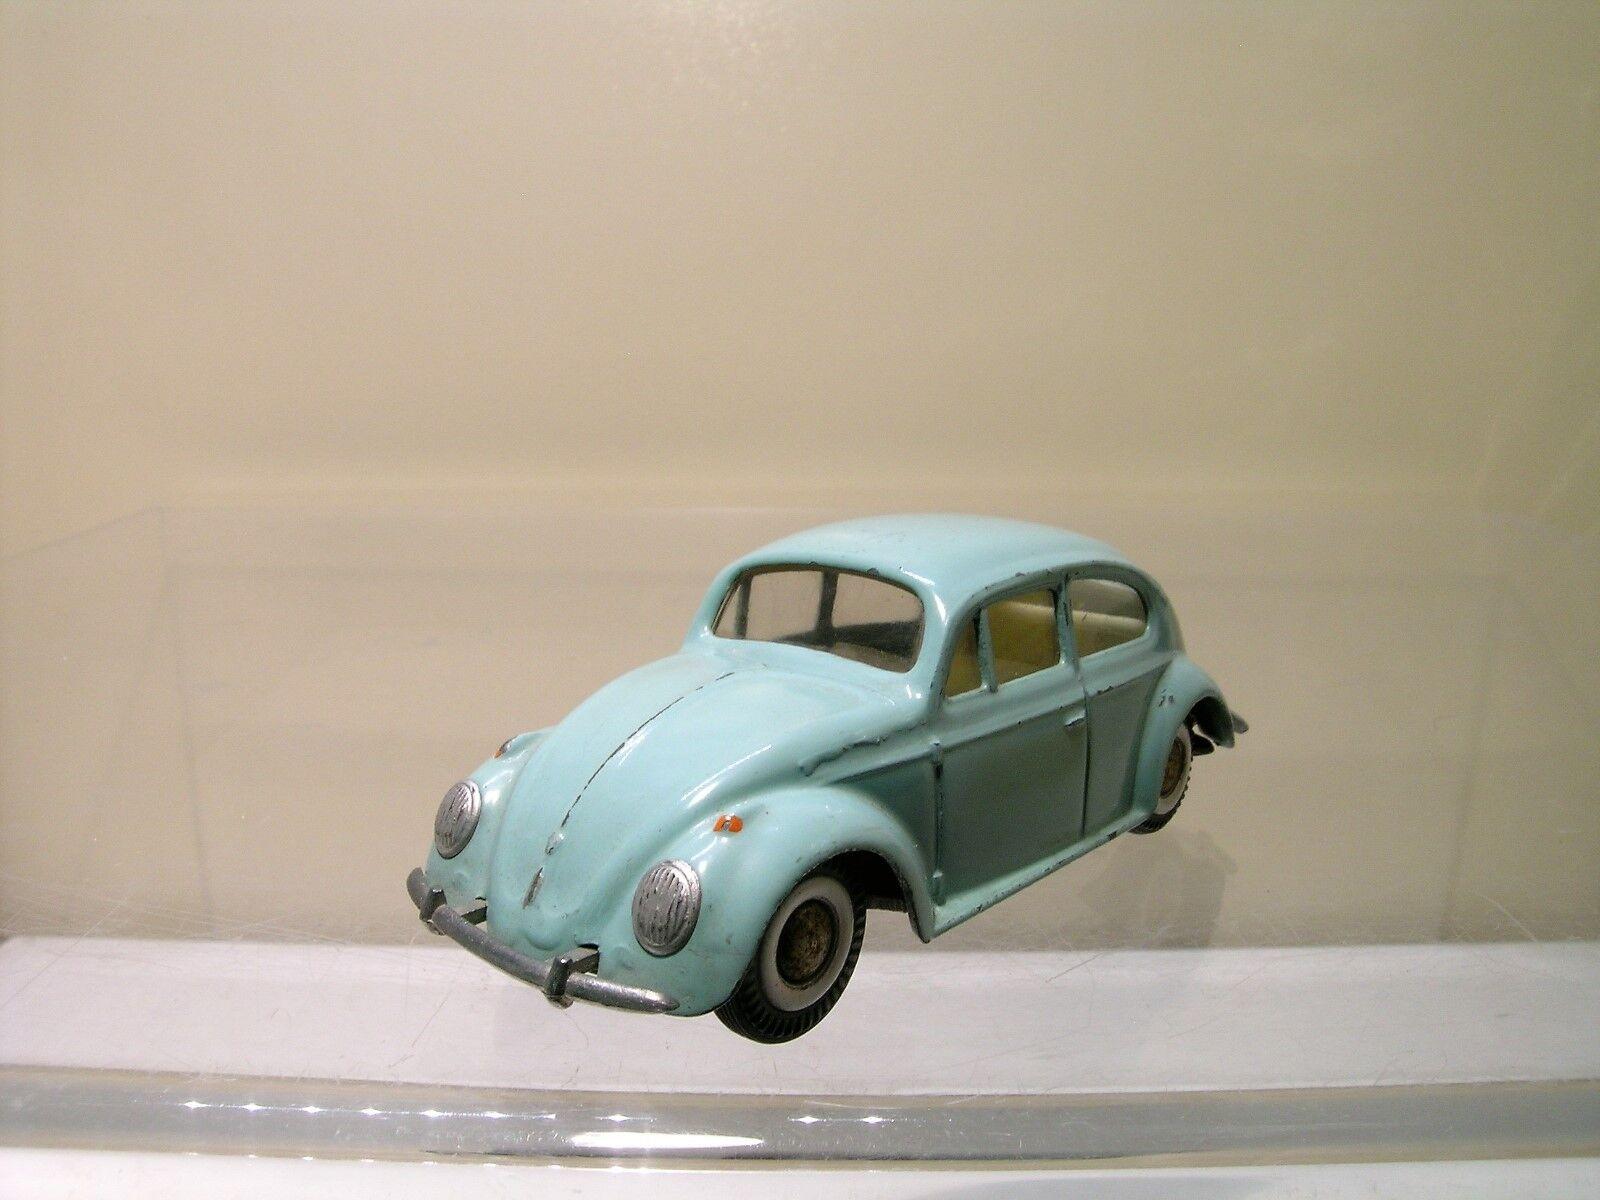 TEKNO DENMARK 819-147 VW VOLKSWAGEN BEETLE 1200 1957 LIGHT bleu SCALE 1 43